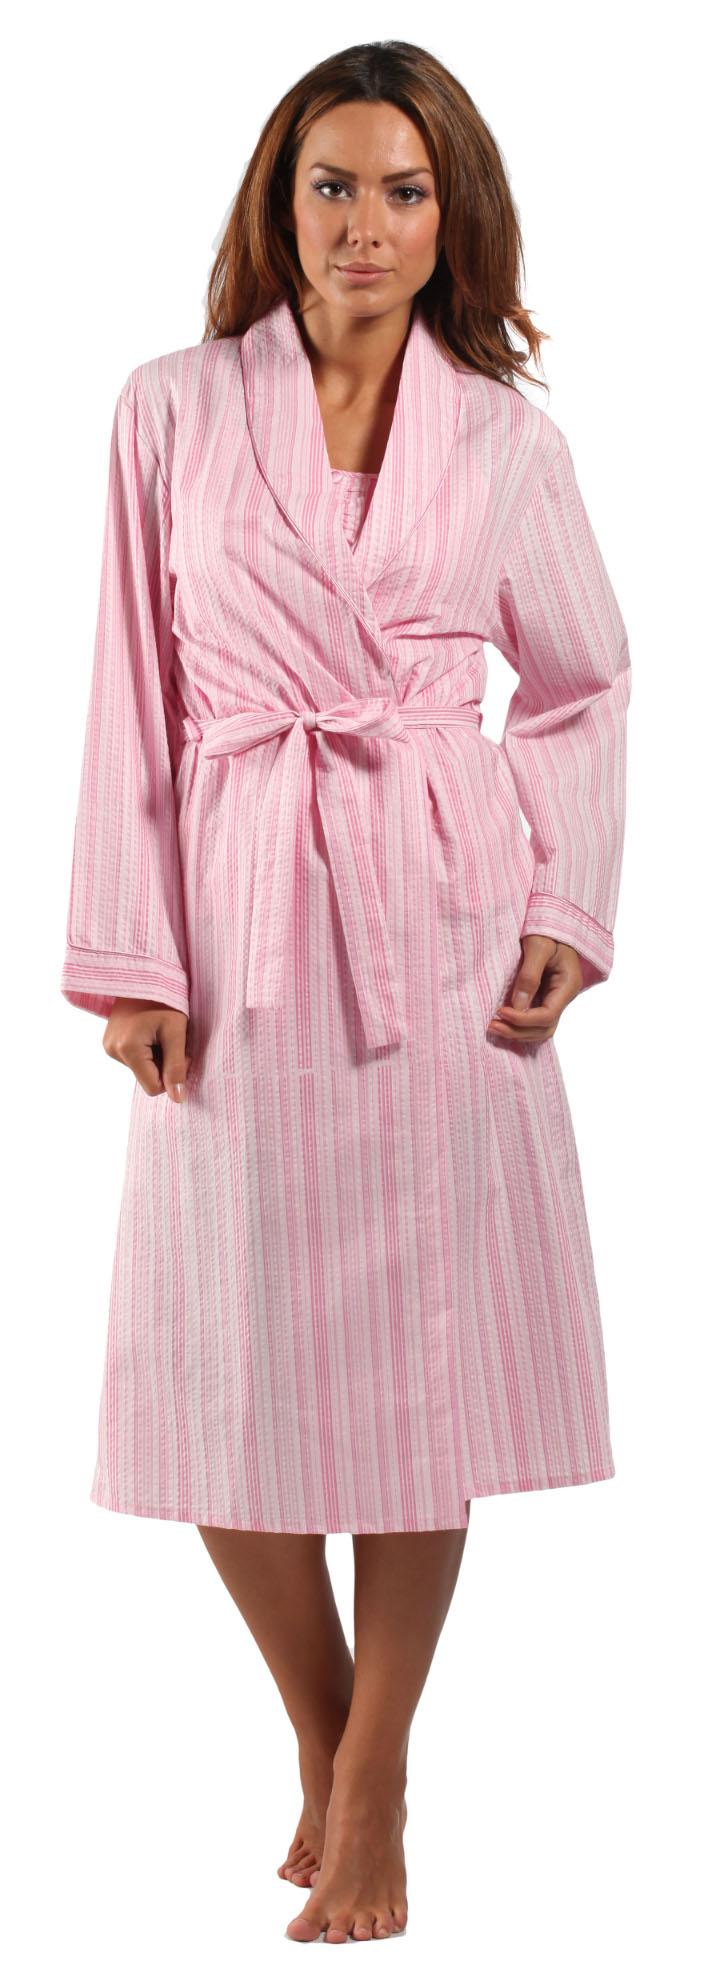 Ladies Cotton Dressing Gowns - Home Decorating Ideas & Interior Design